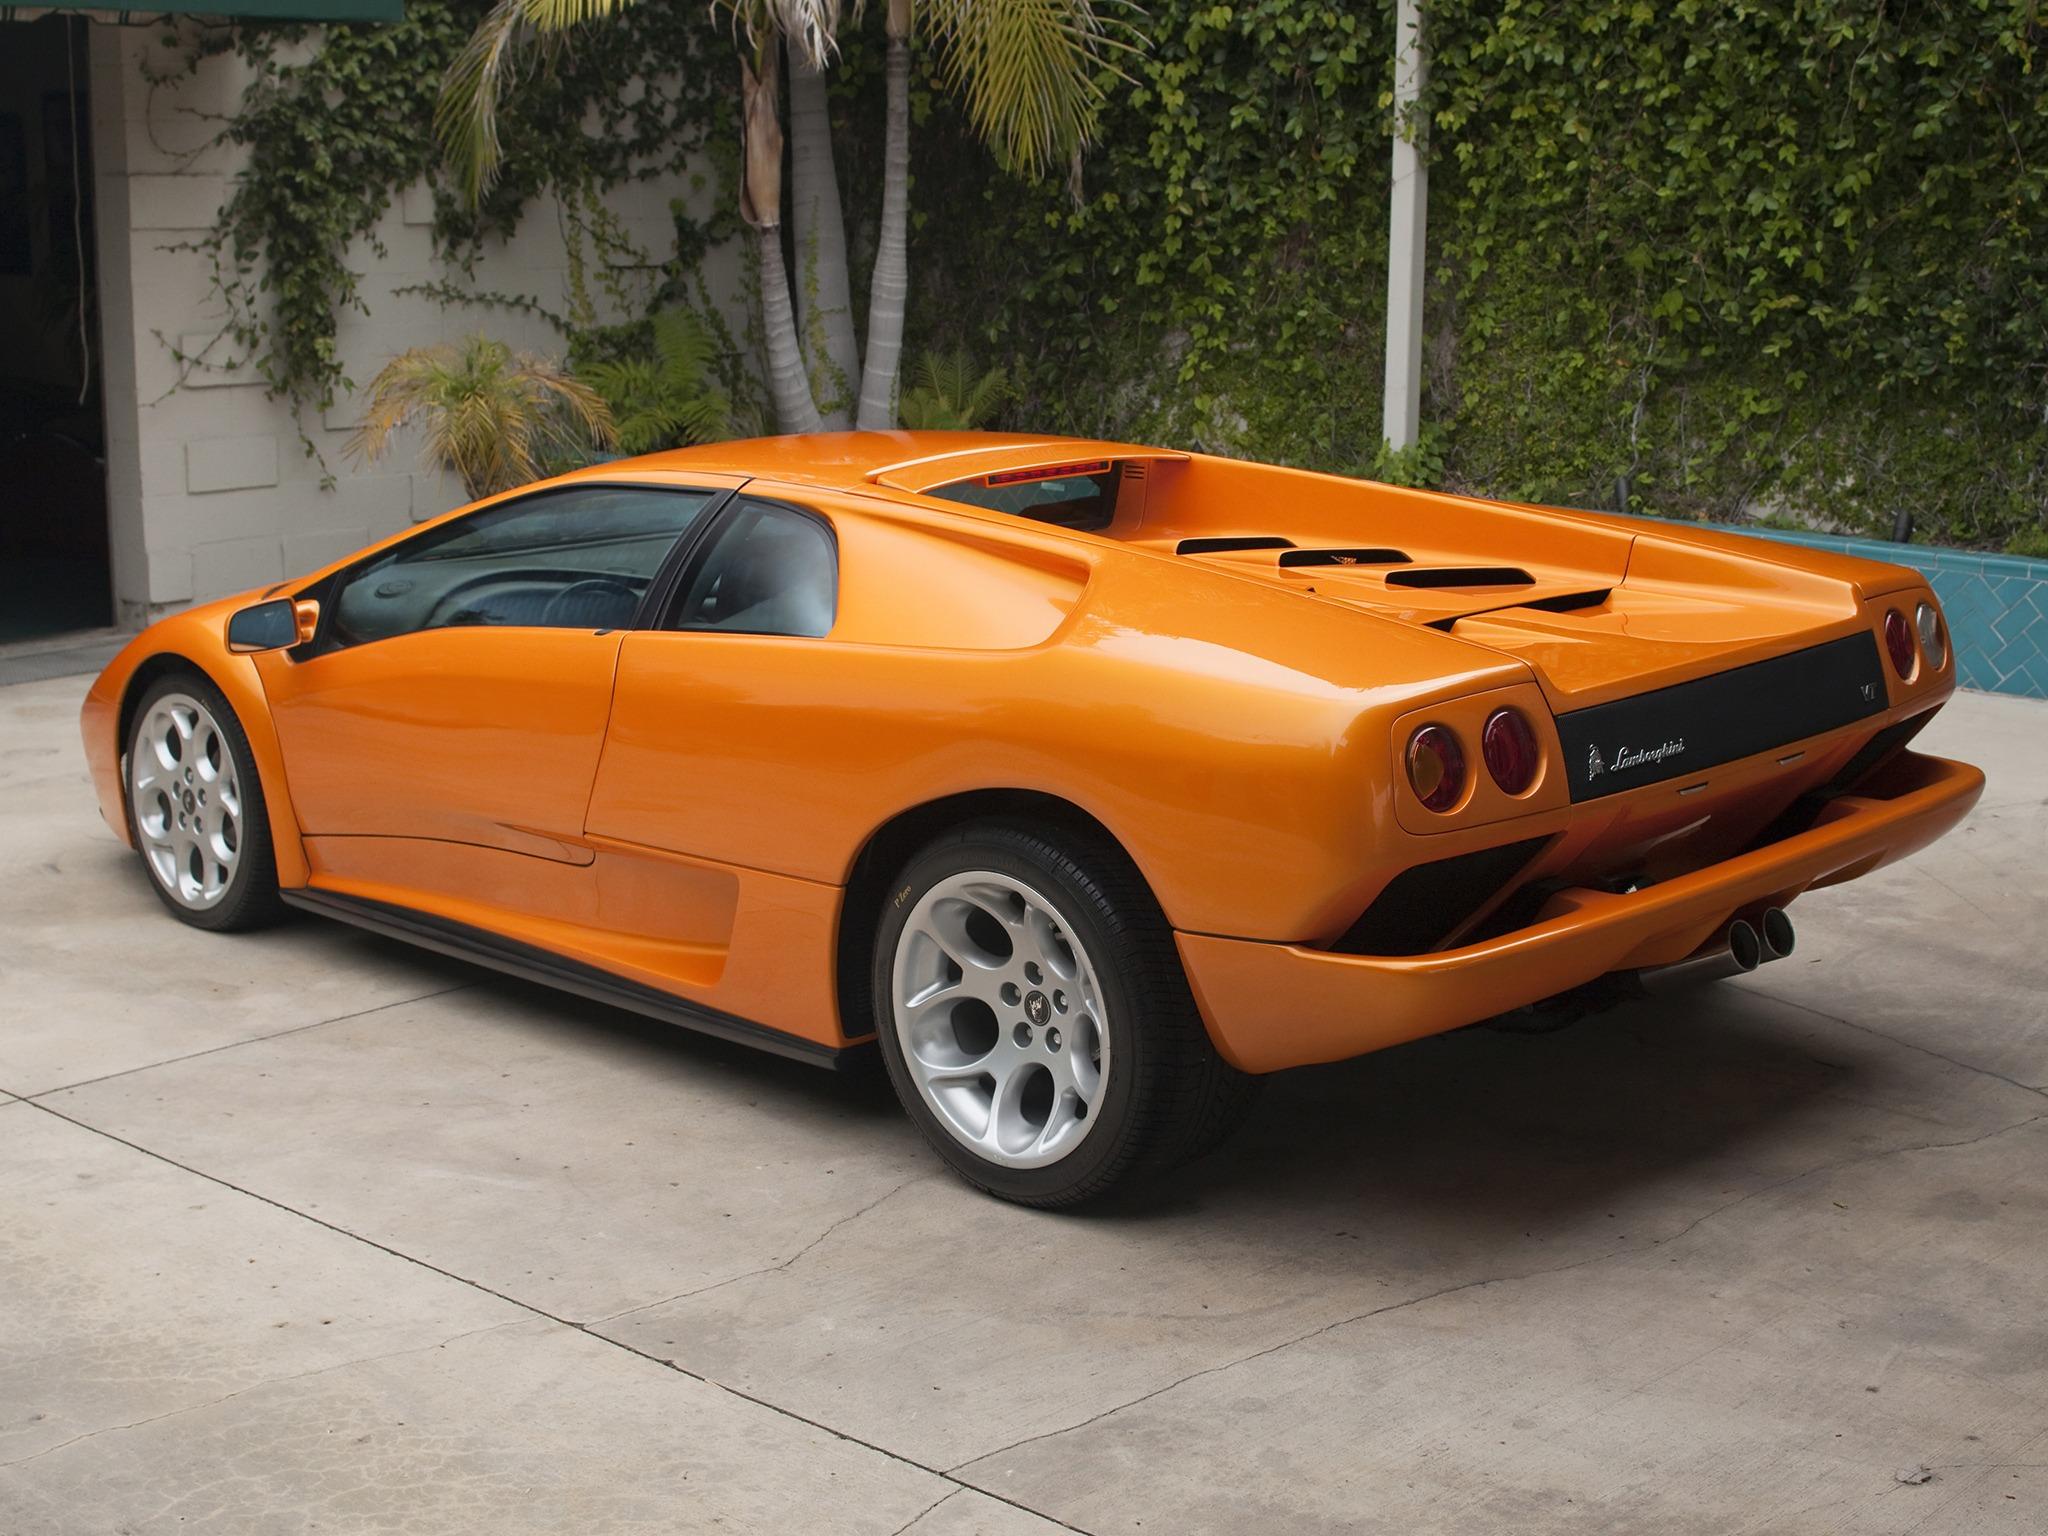 Lamborghini Diablo Styling Prototype 2000 Old Concept Cars